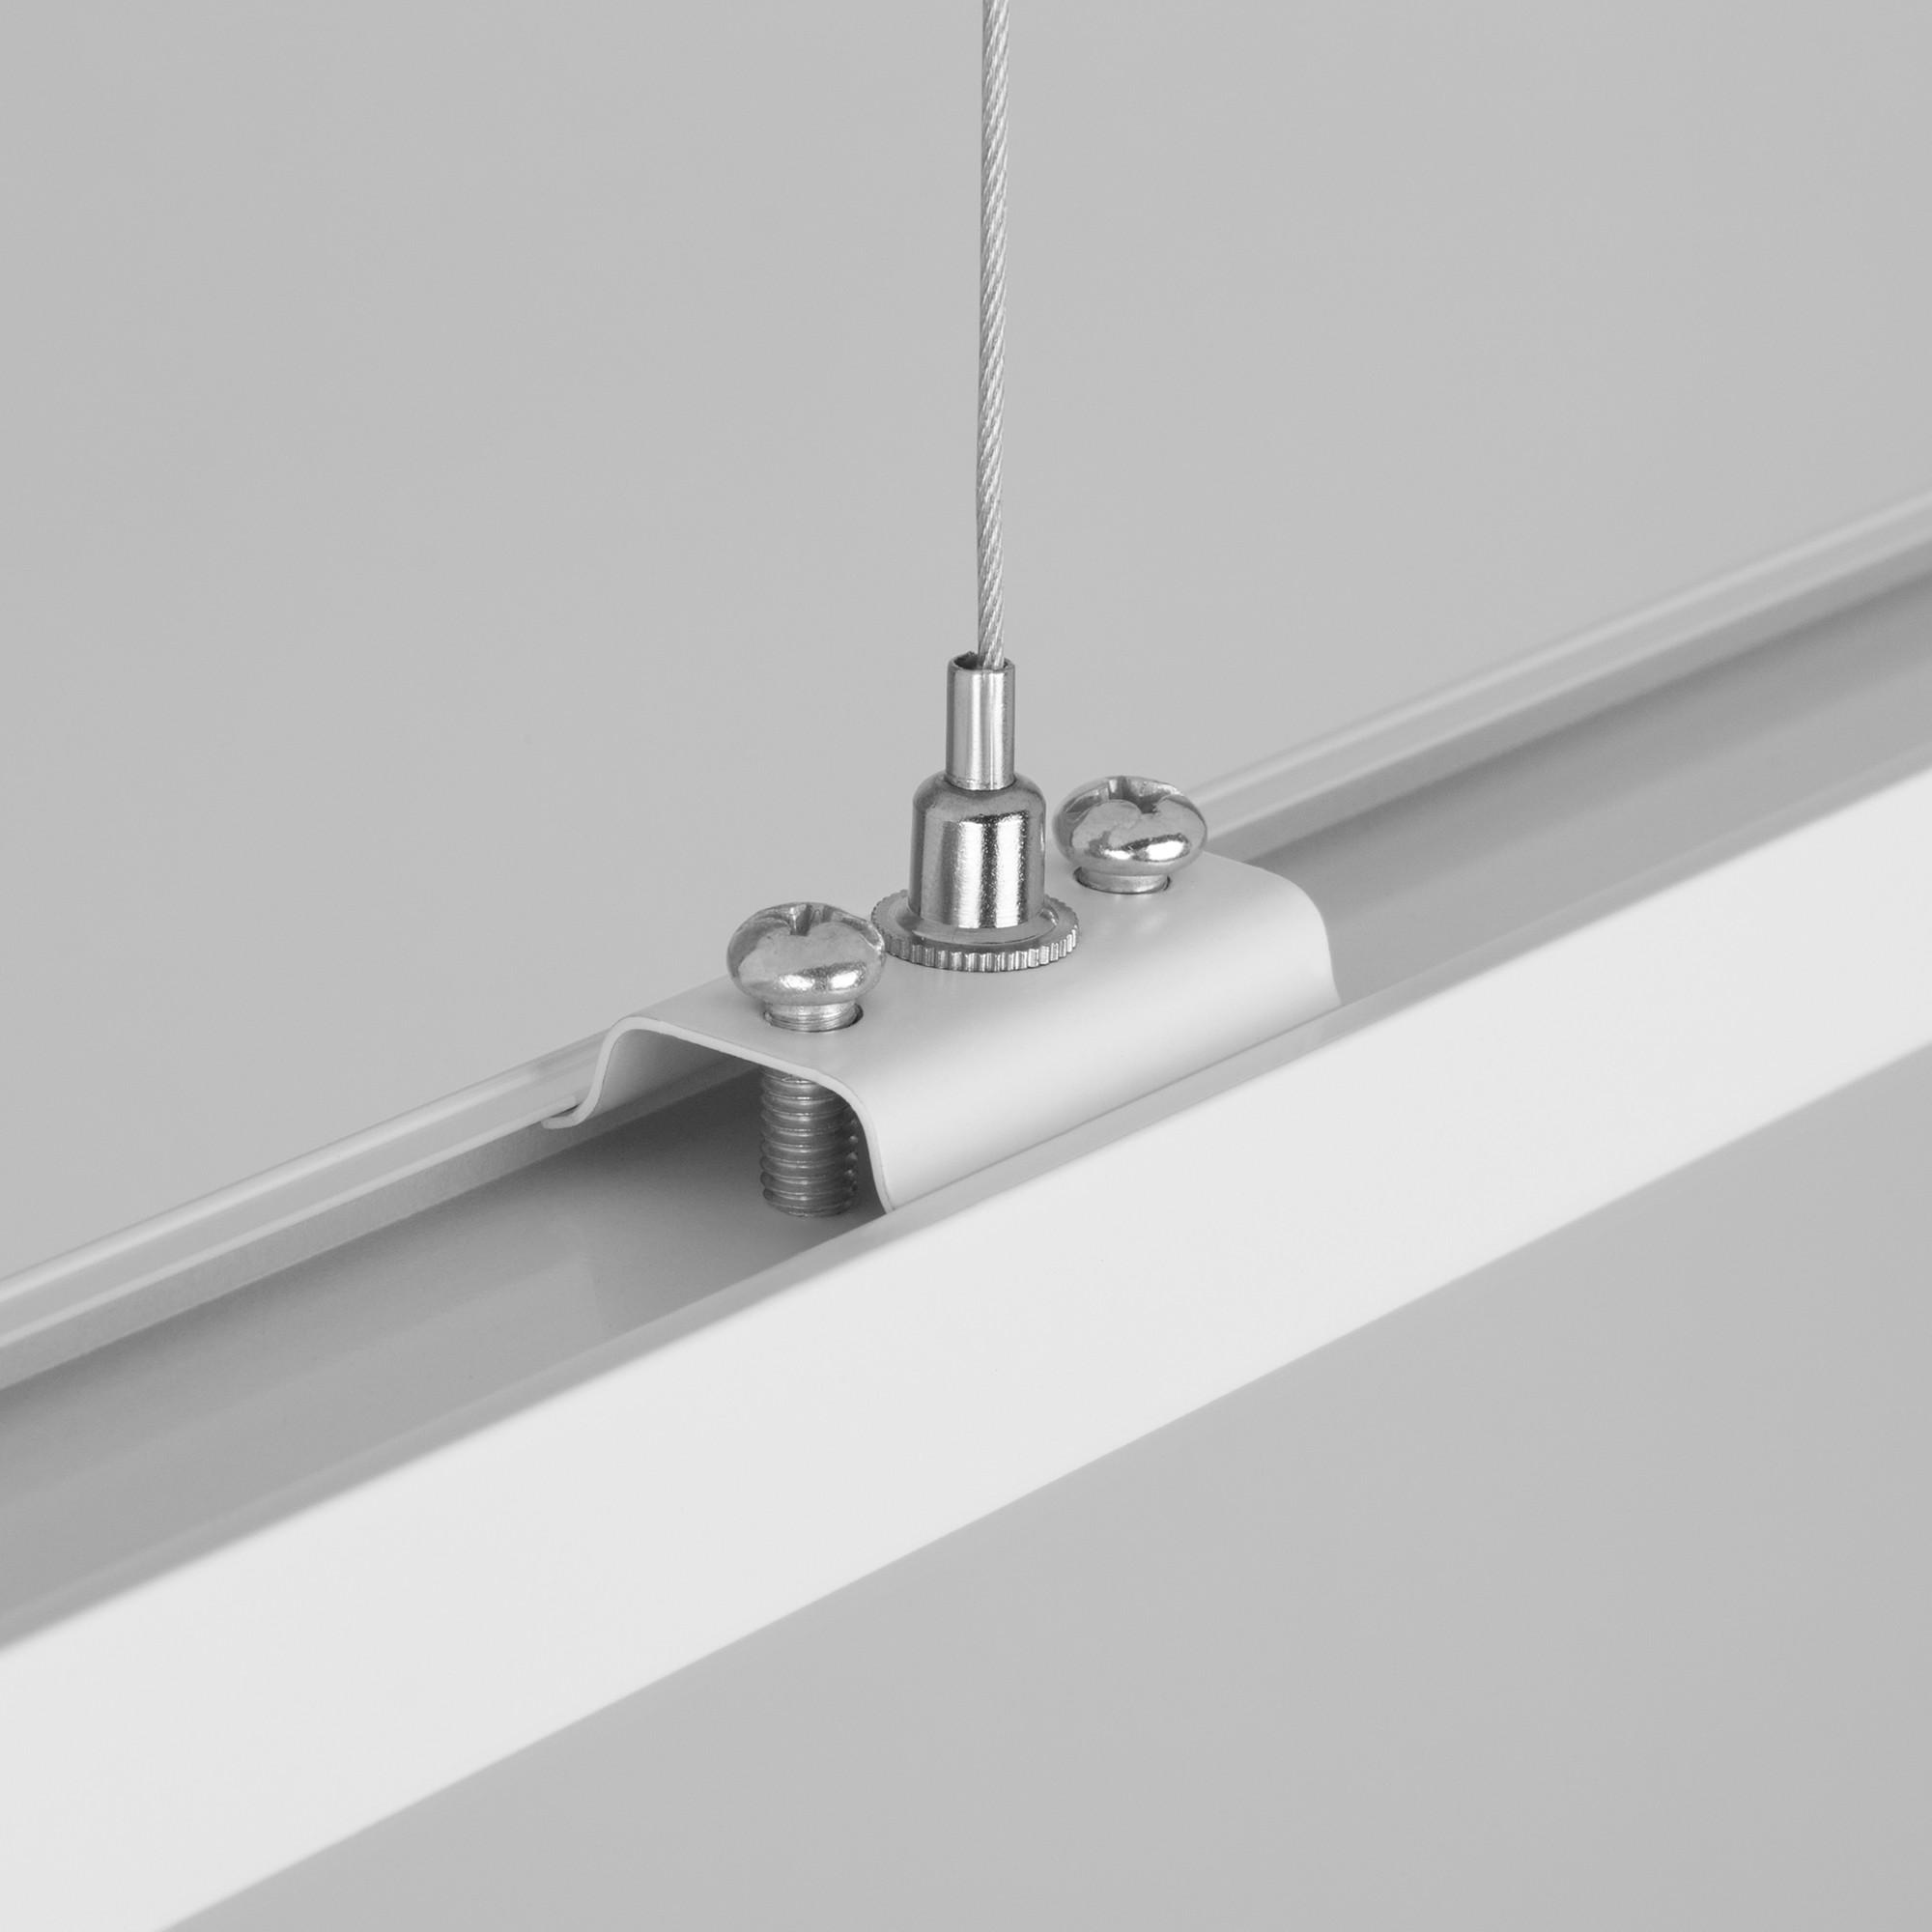 TRF-1-200-WH / Набор для подвеса белый (2 м.)